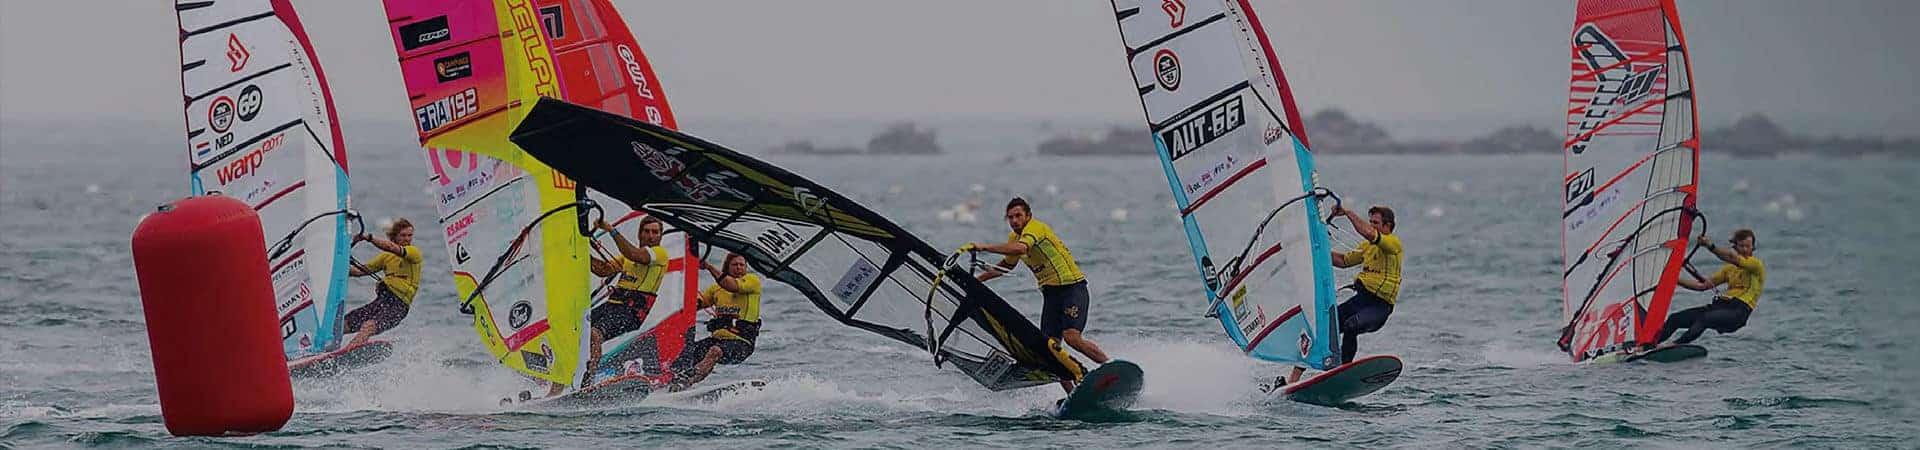 Tips for Windsurfing Beginners | Nemely Windsurf & SUP